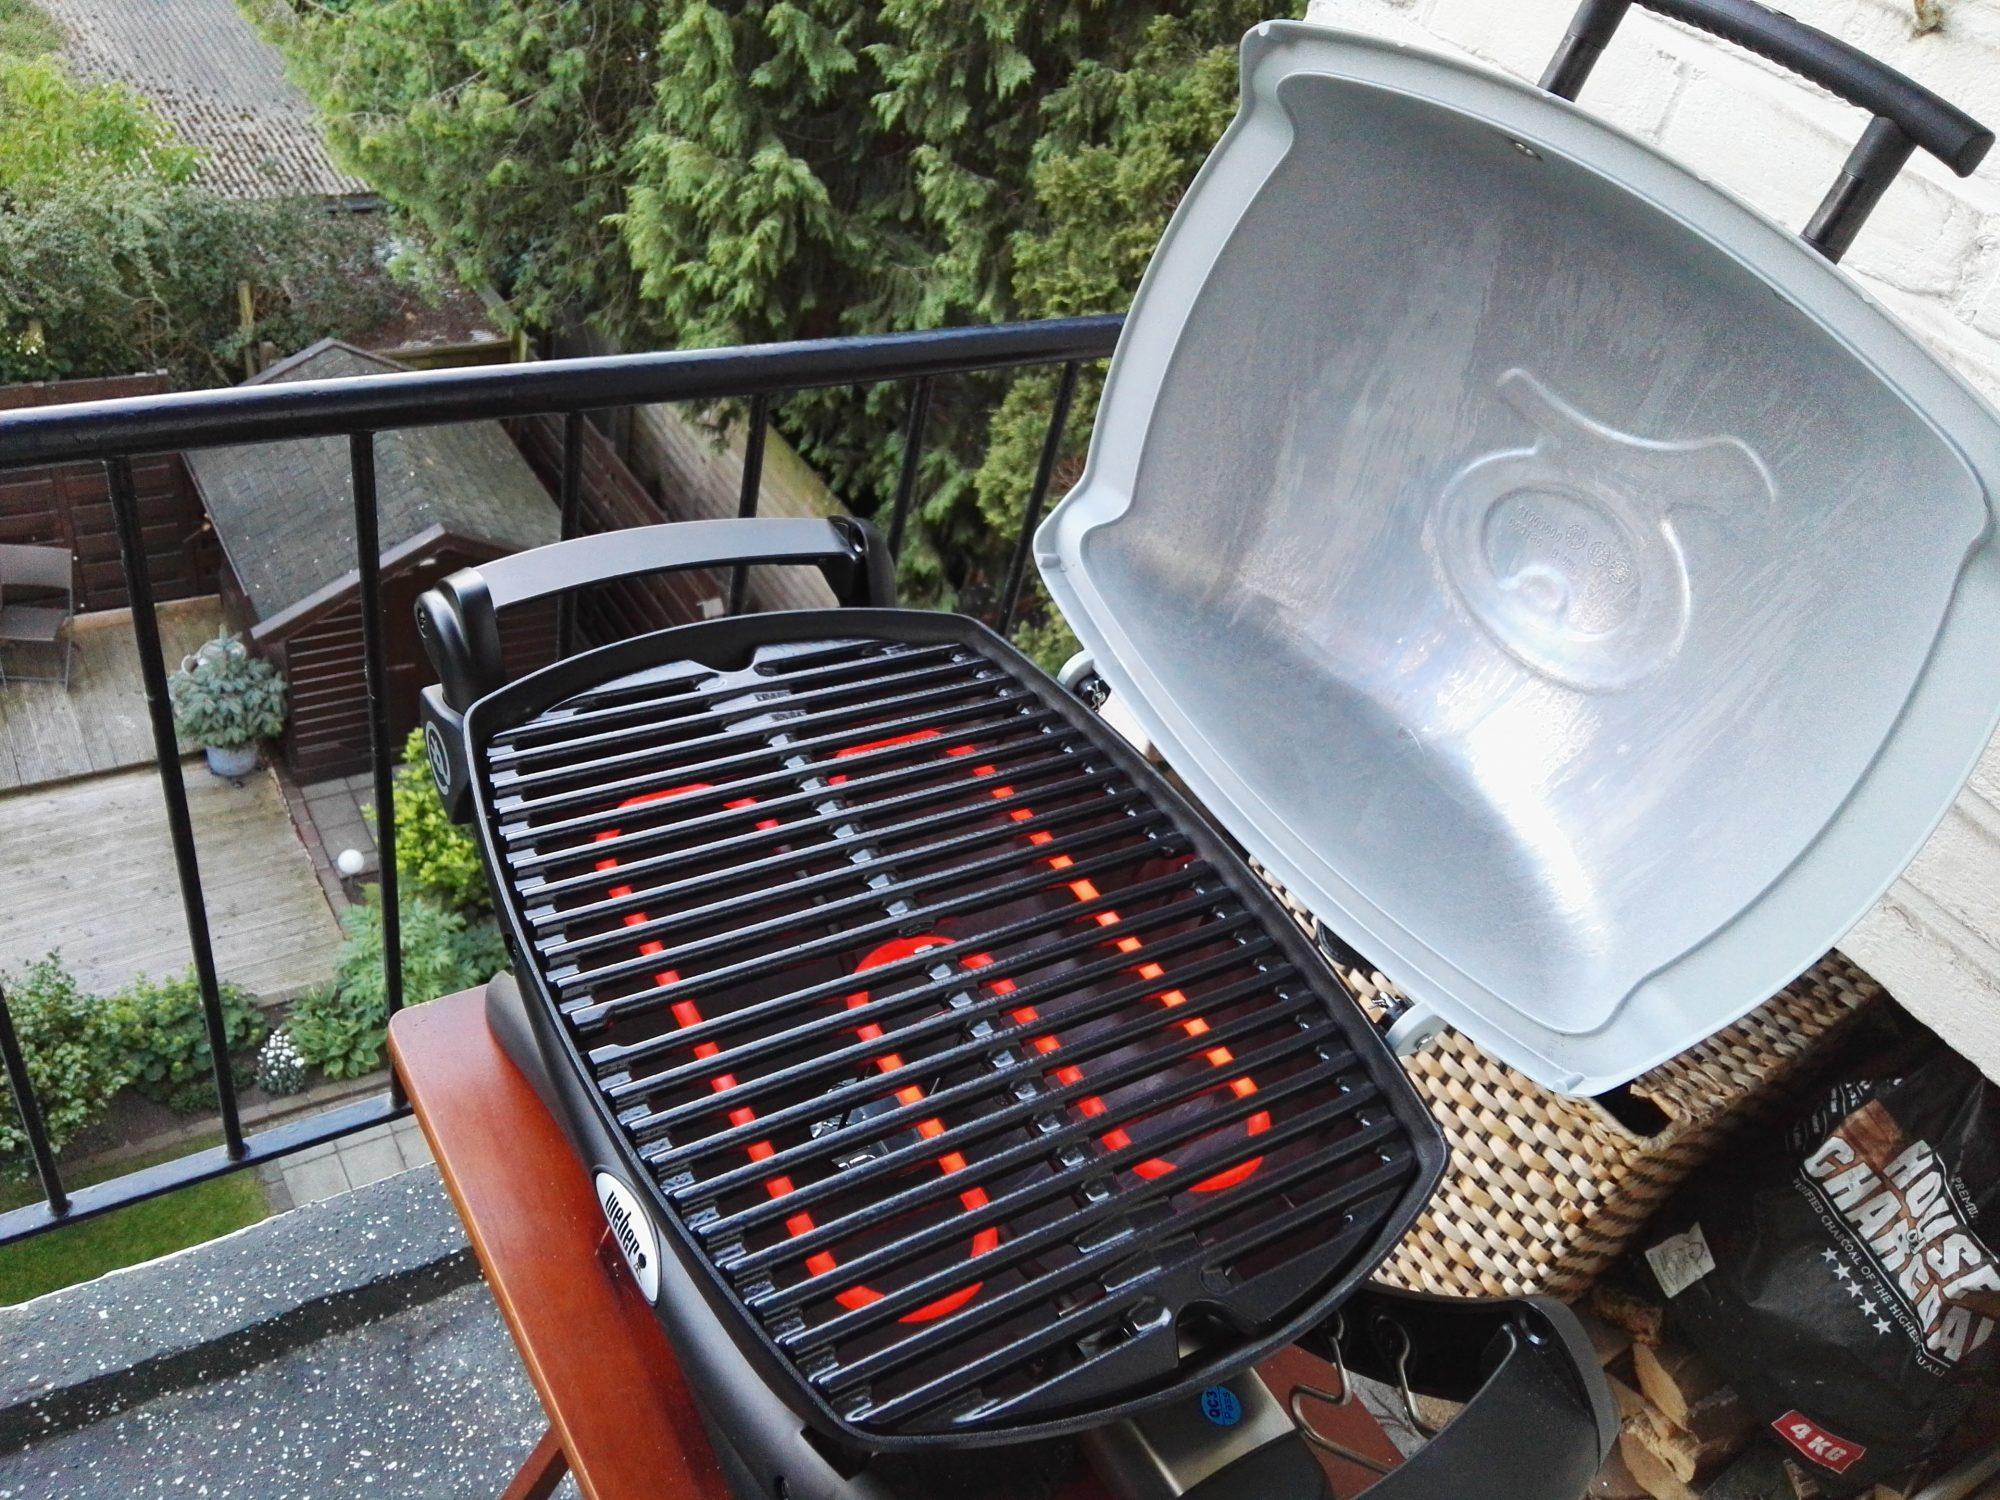 Review weber q1400 elektrische bbq - Barbecue weber q1400 ...